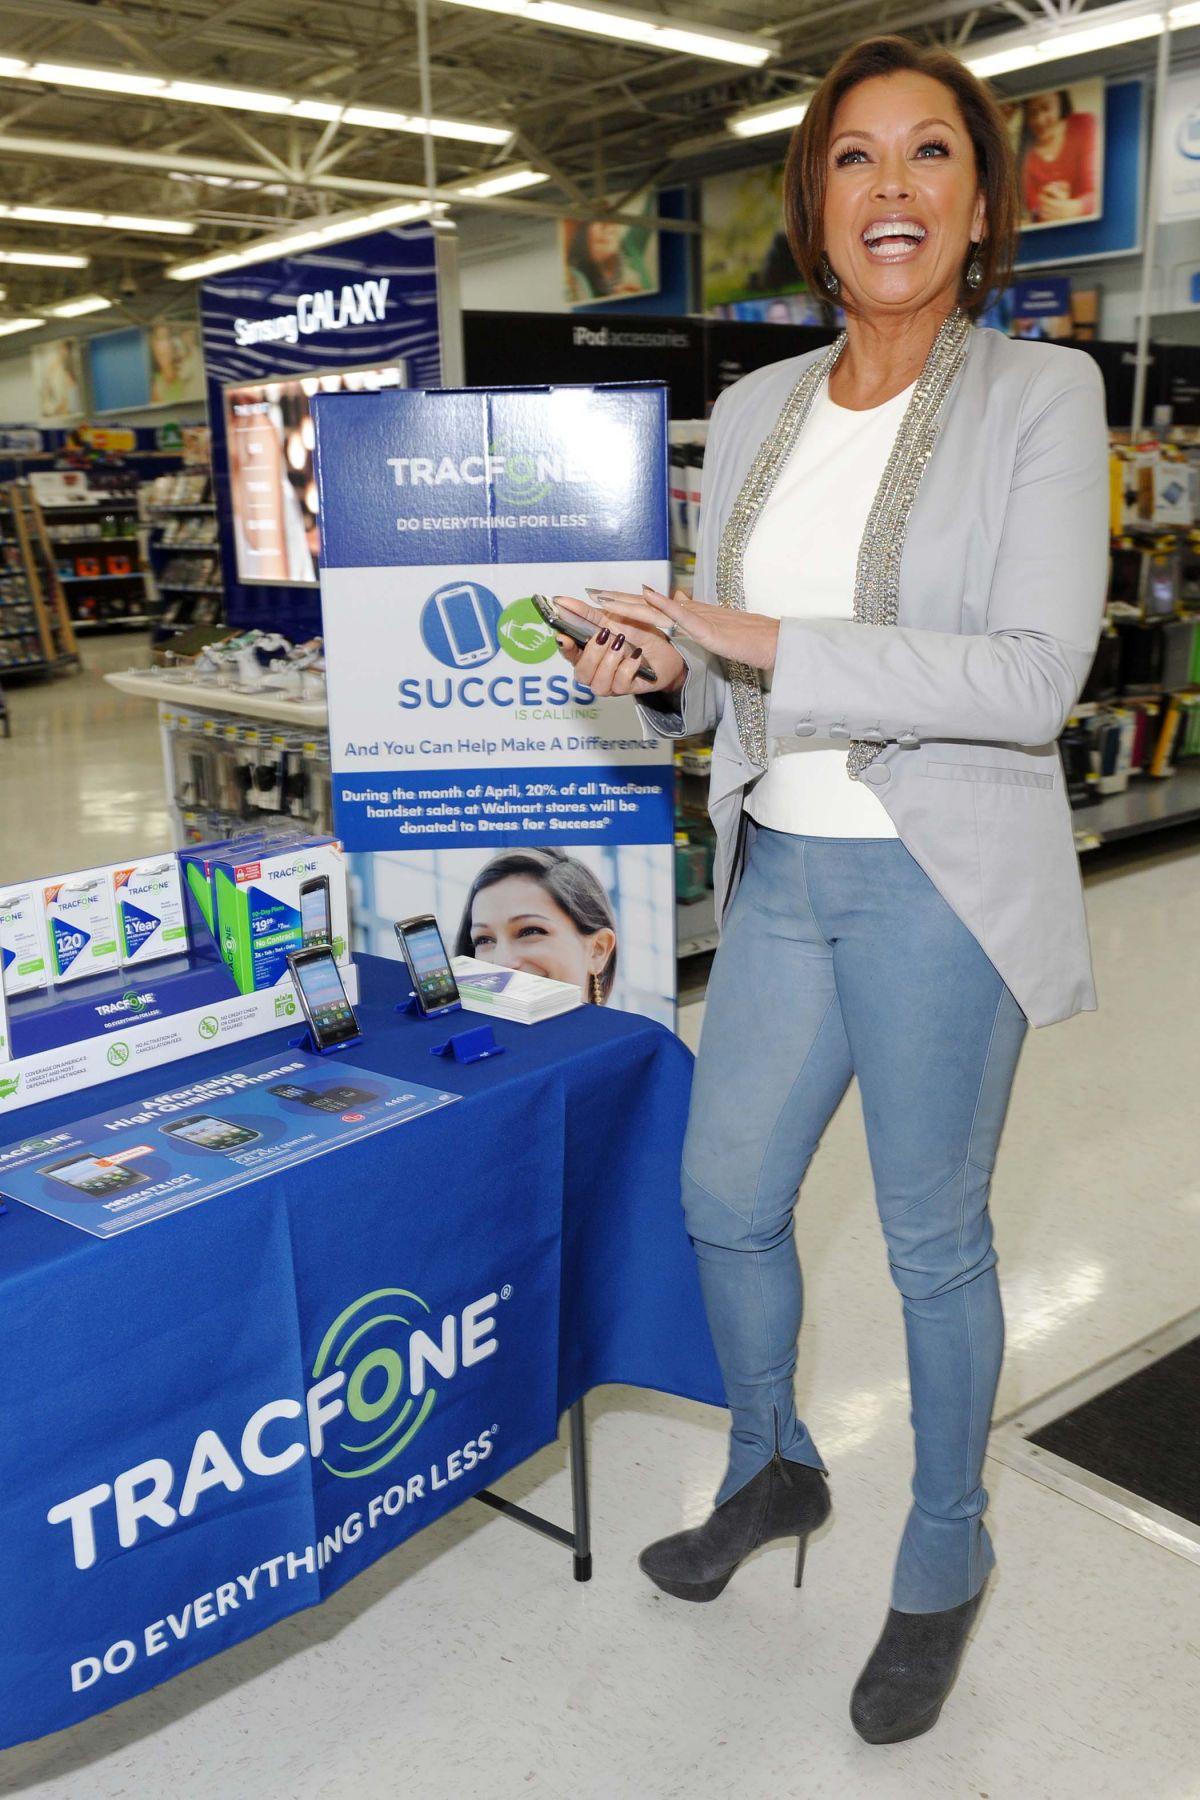 VANESSA WILLIAMS at Tracfone Promo Event in Walmart in Secaucus